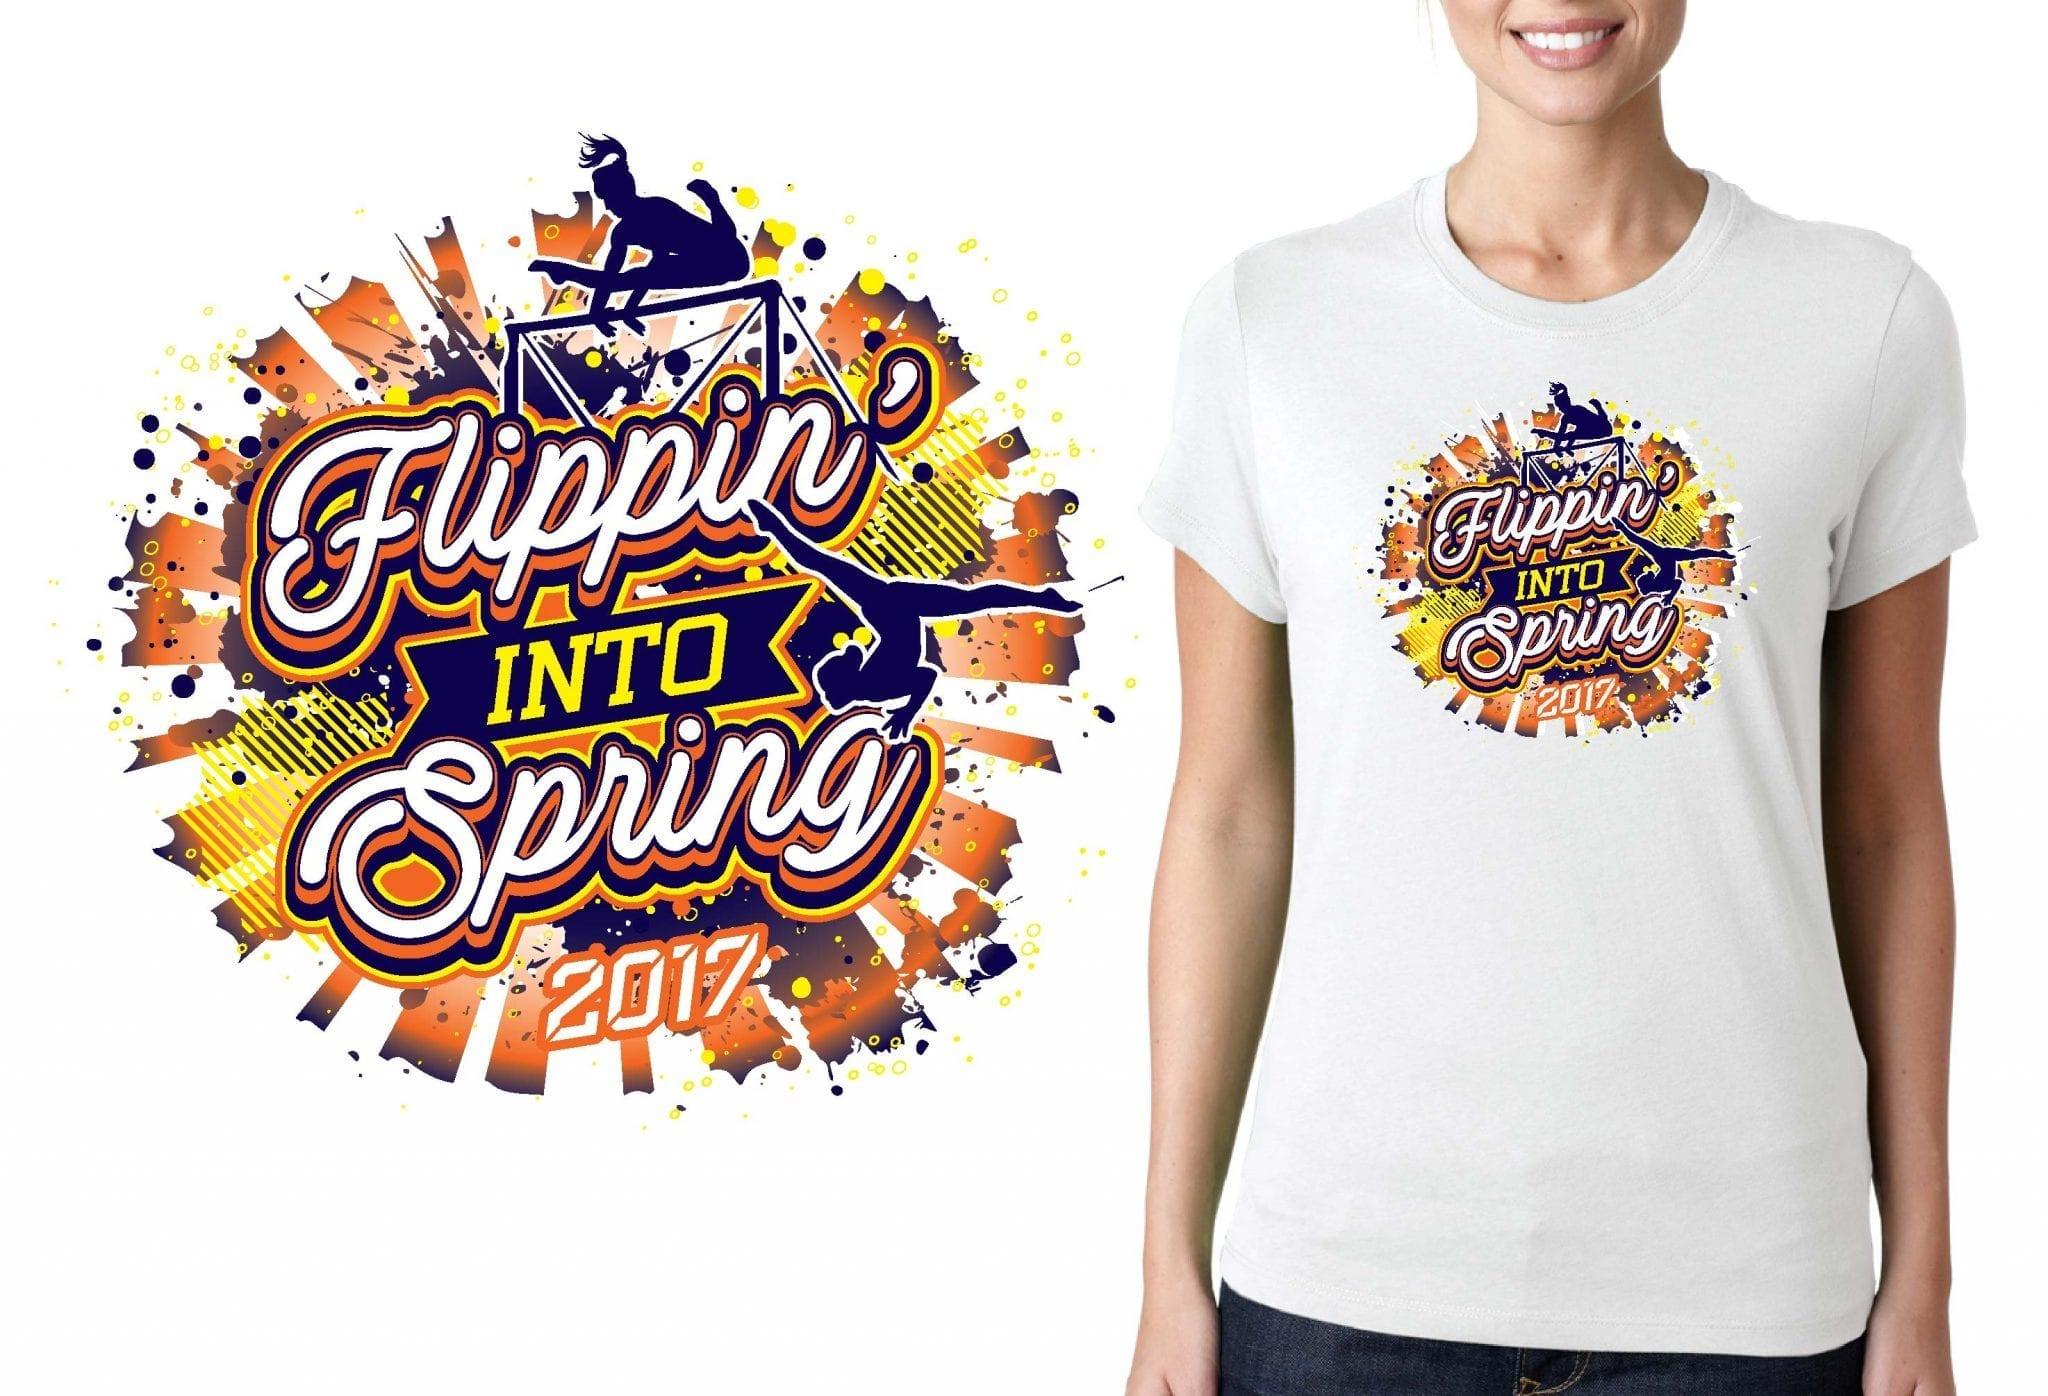 GYMNASTICS TSHIRT LOGO for Flippin-into-Spring BY UrArtStudio